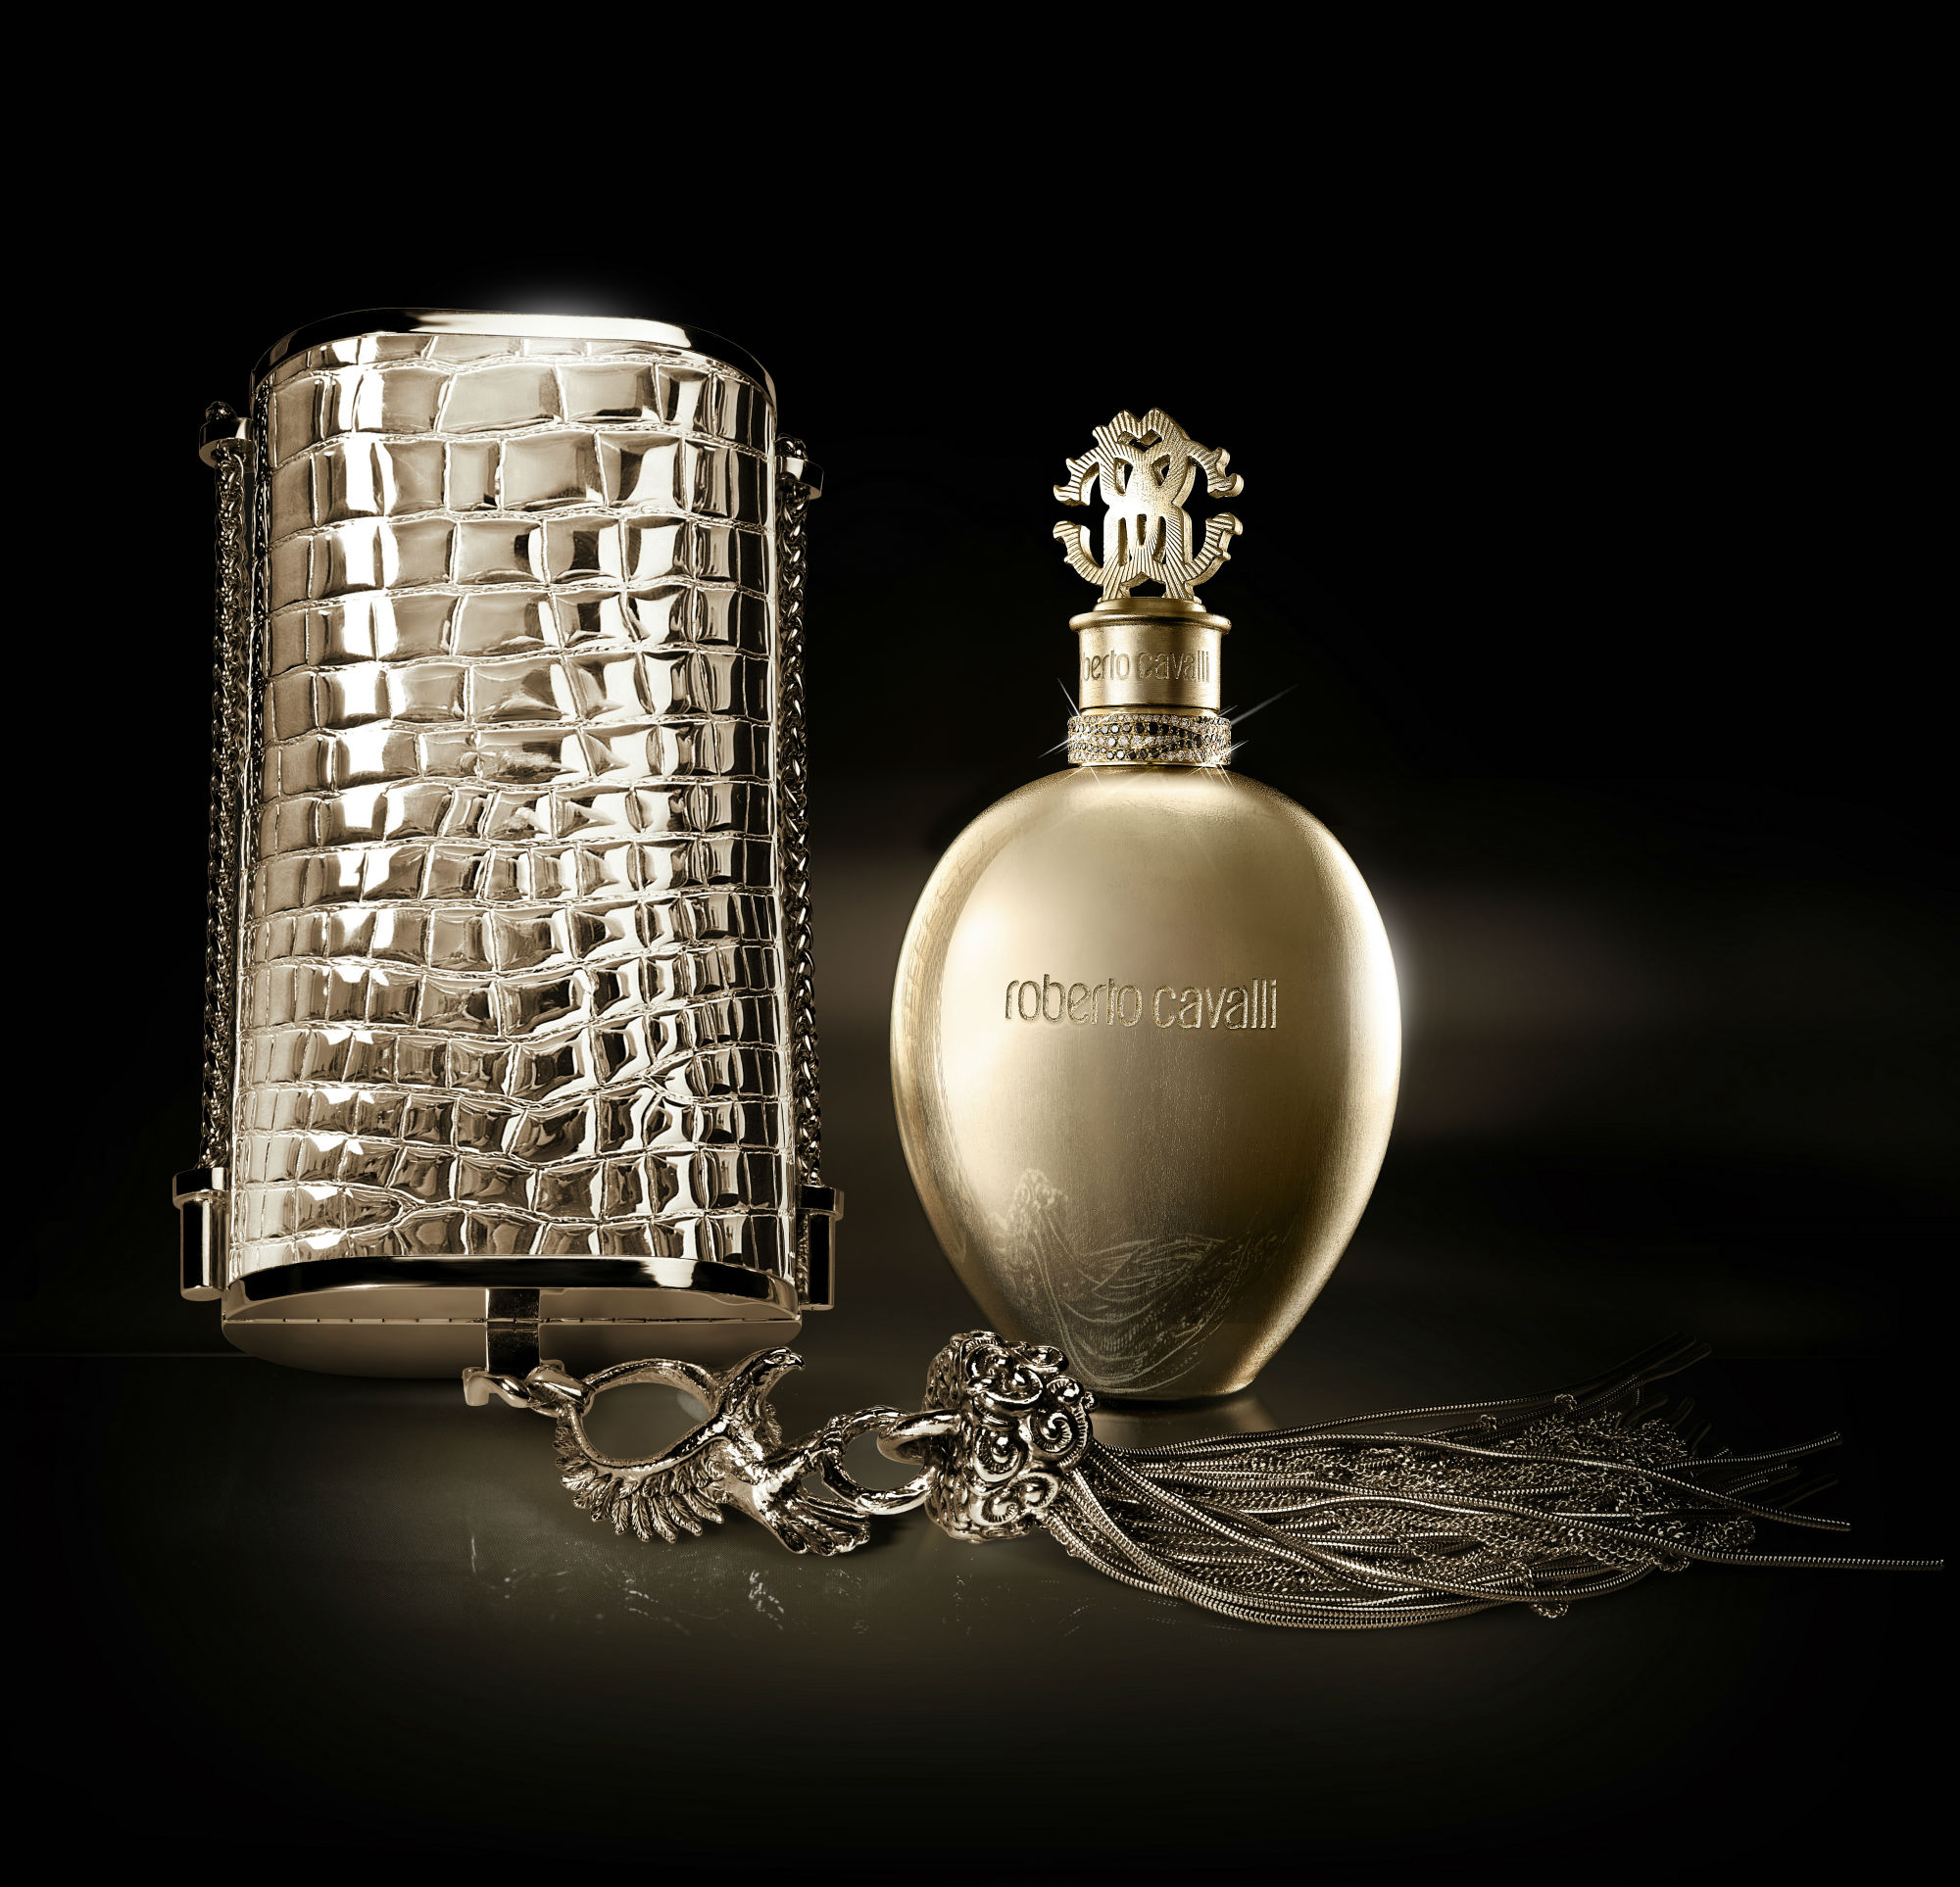 Roberto Cavalli Gold Edition Roberto Cavalli Perfume A Fragrance